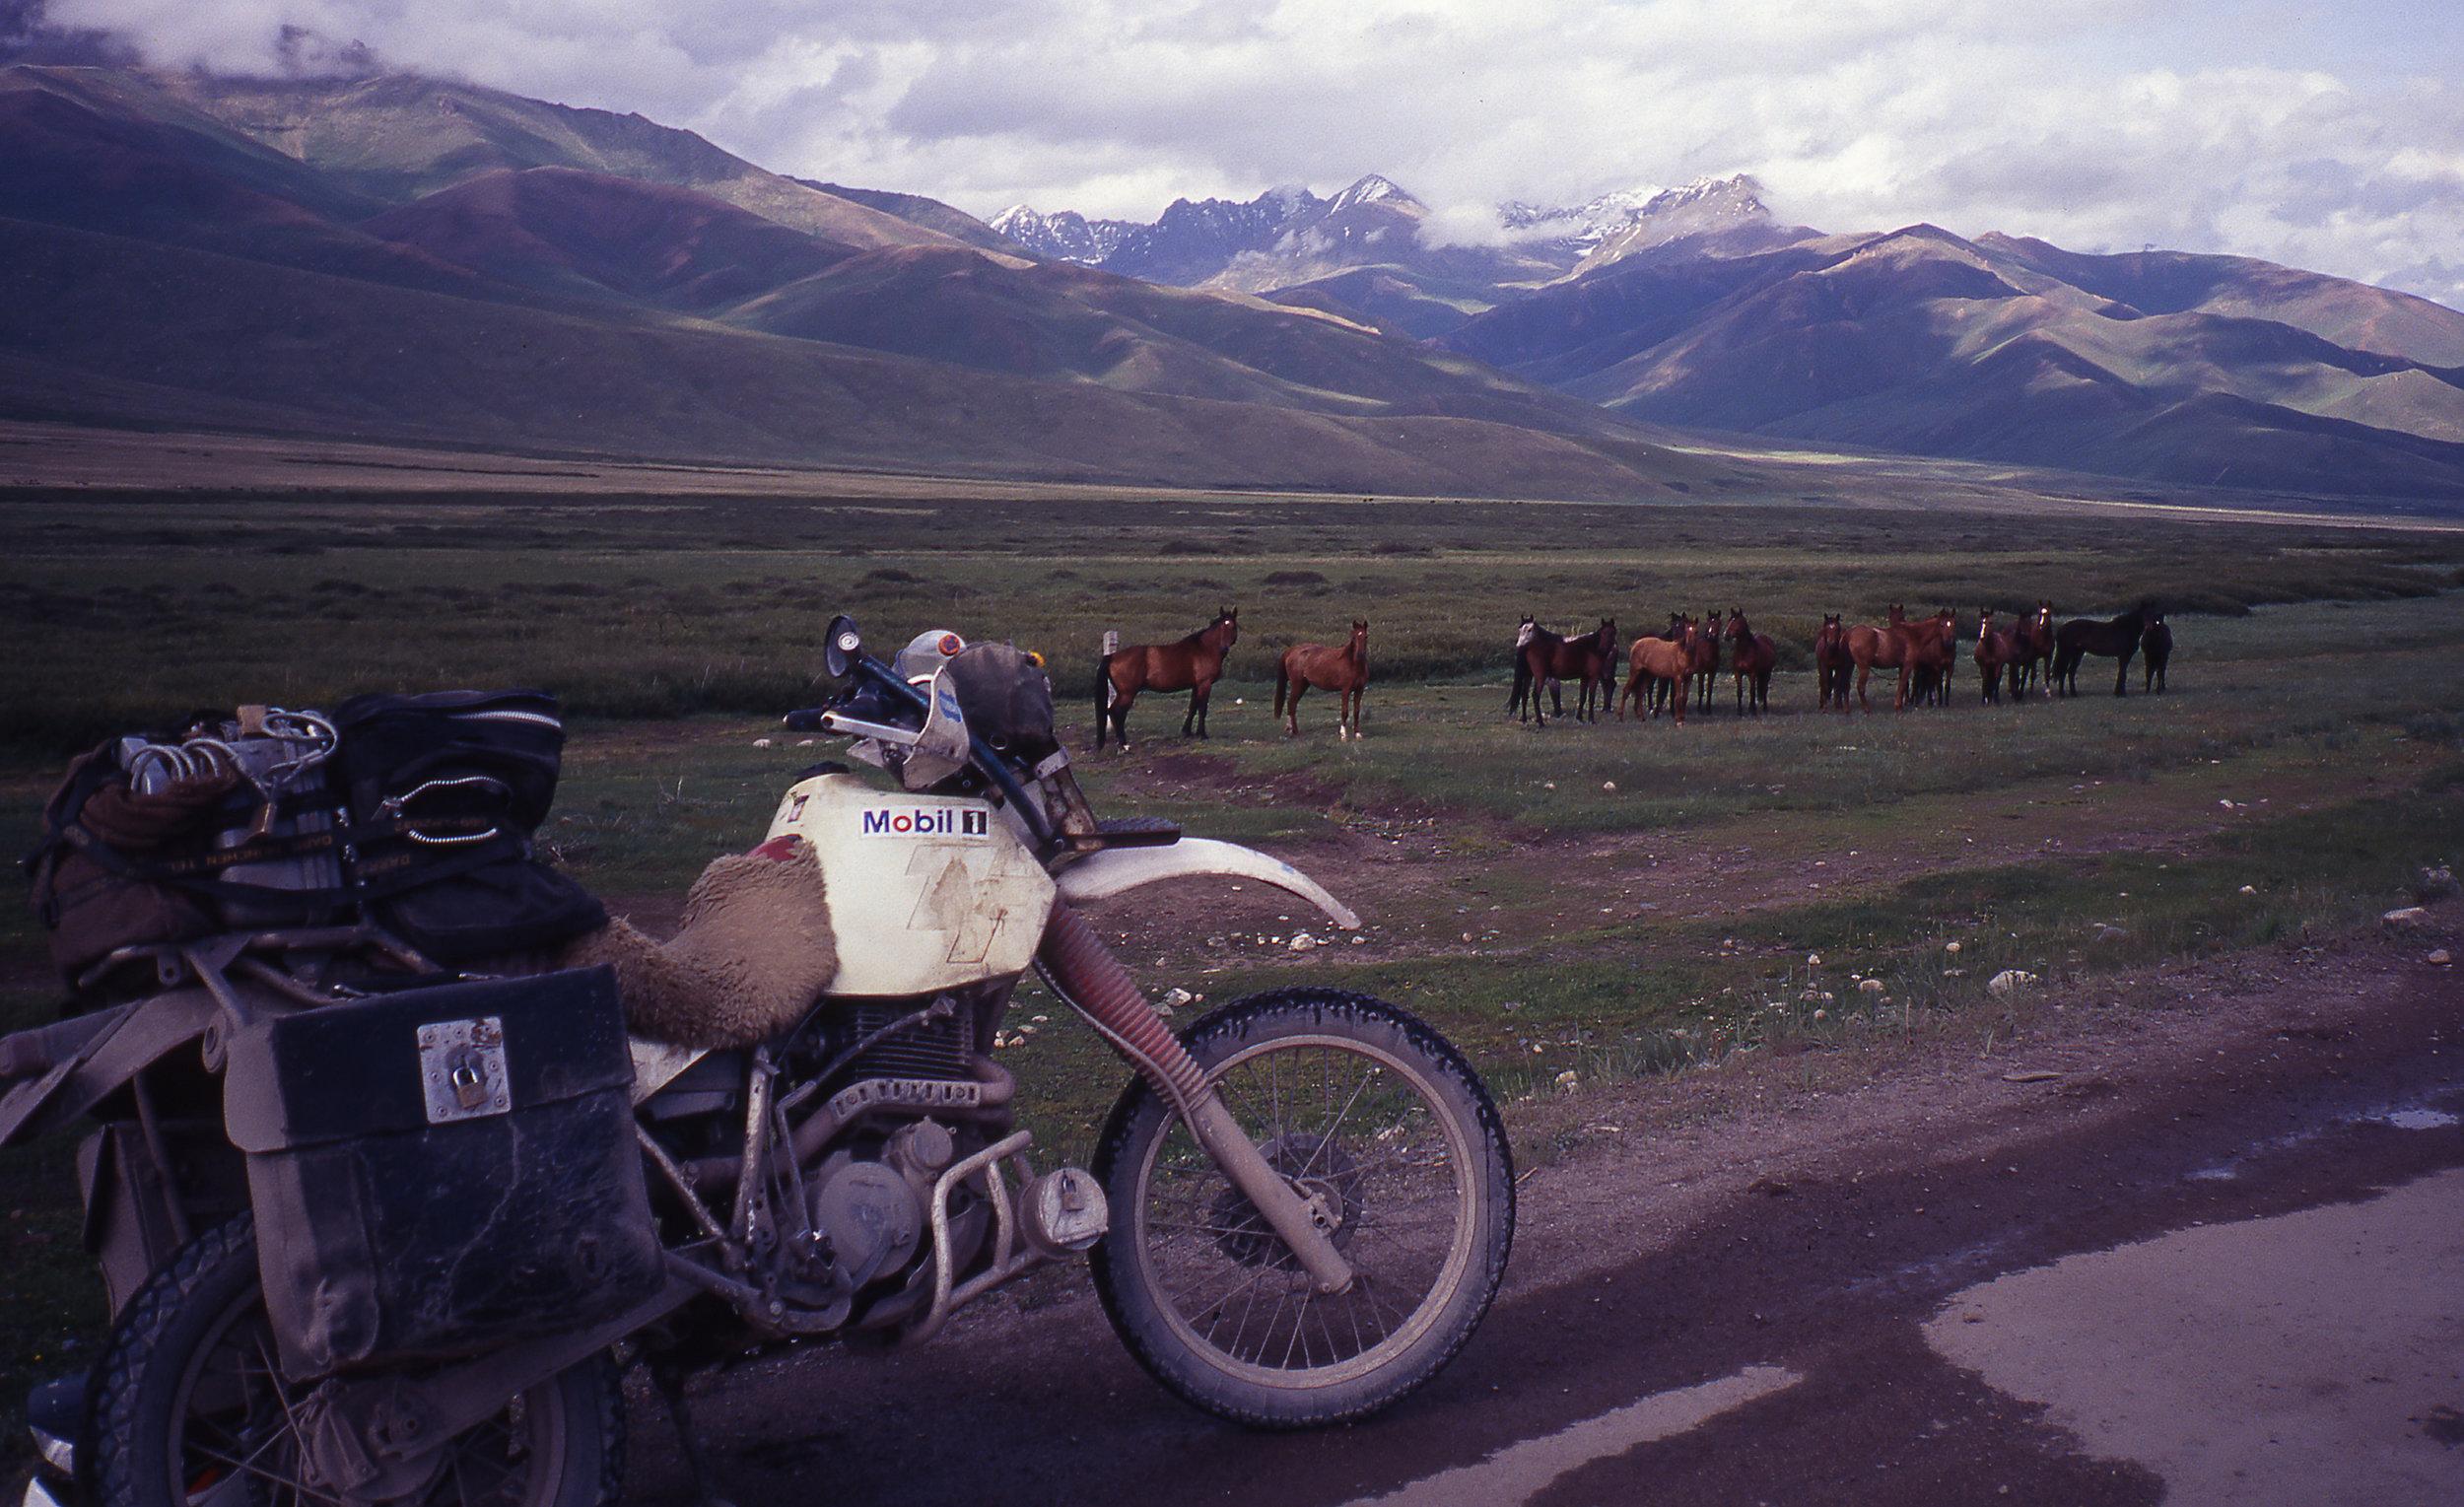 Heather-Ellis-Adventure-Rider-Radio-Motorcycle-Podcast-5.jpg